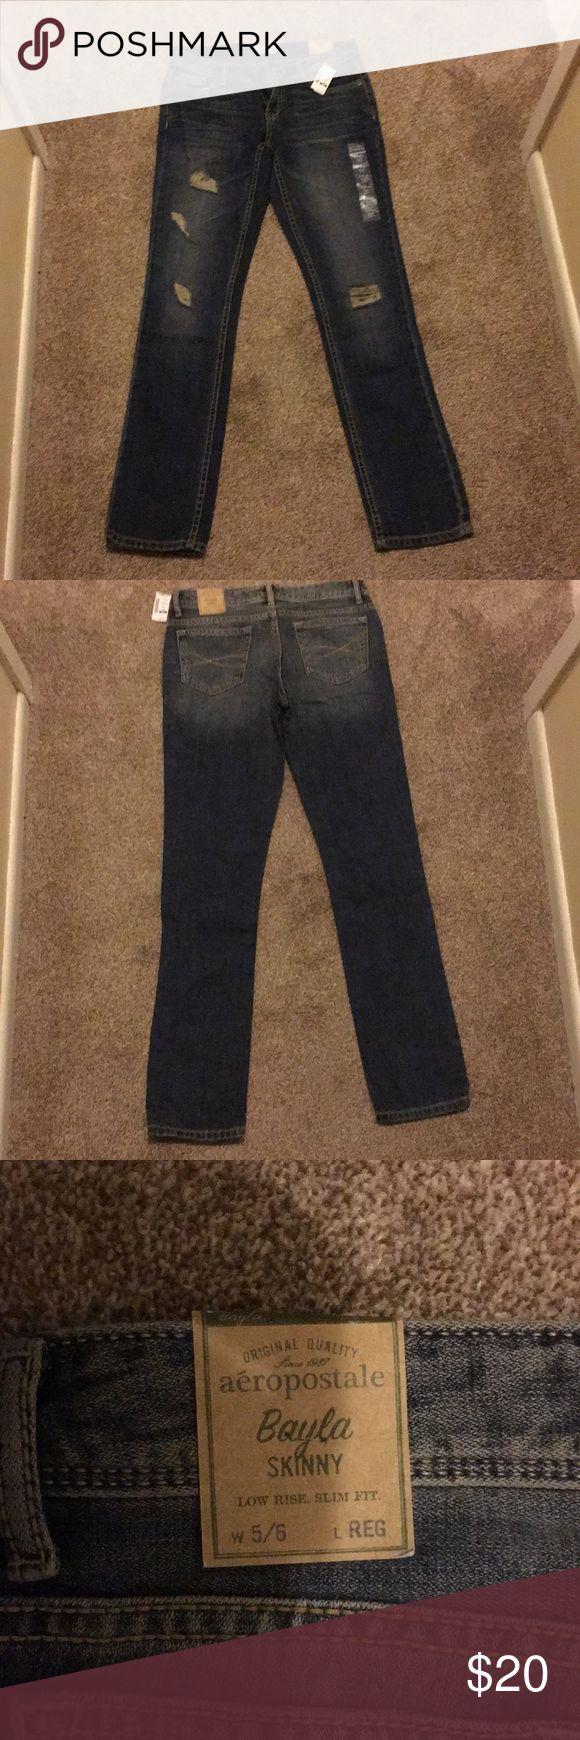 Skinny jeans women's Brand new women's skinny jeans. Aeropostale, size 5/6 regular. Inseam about 30.5 inches Front rise about 8 inches Waist about 14 inches Aeropostale Jeans Skinny